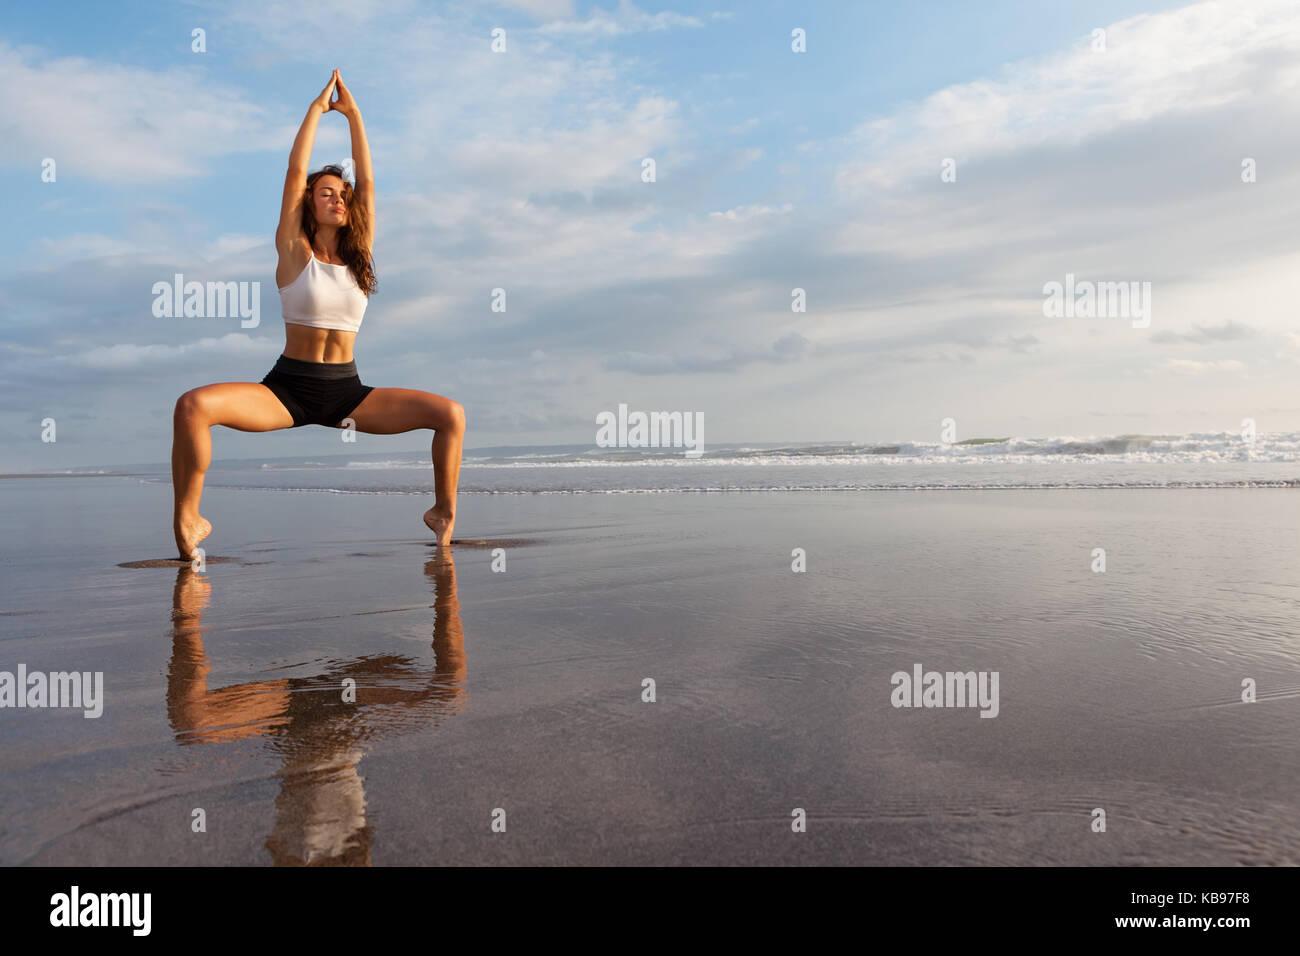 Meditation über Sonnenuntergang Himmel Hintergrund. Junge aktive Frau in Yoga Pose auf Meer Strand, Stretching Stockbild